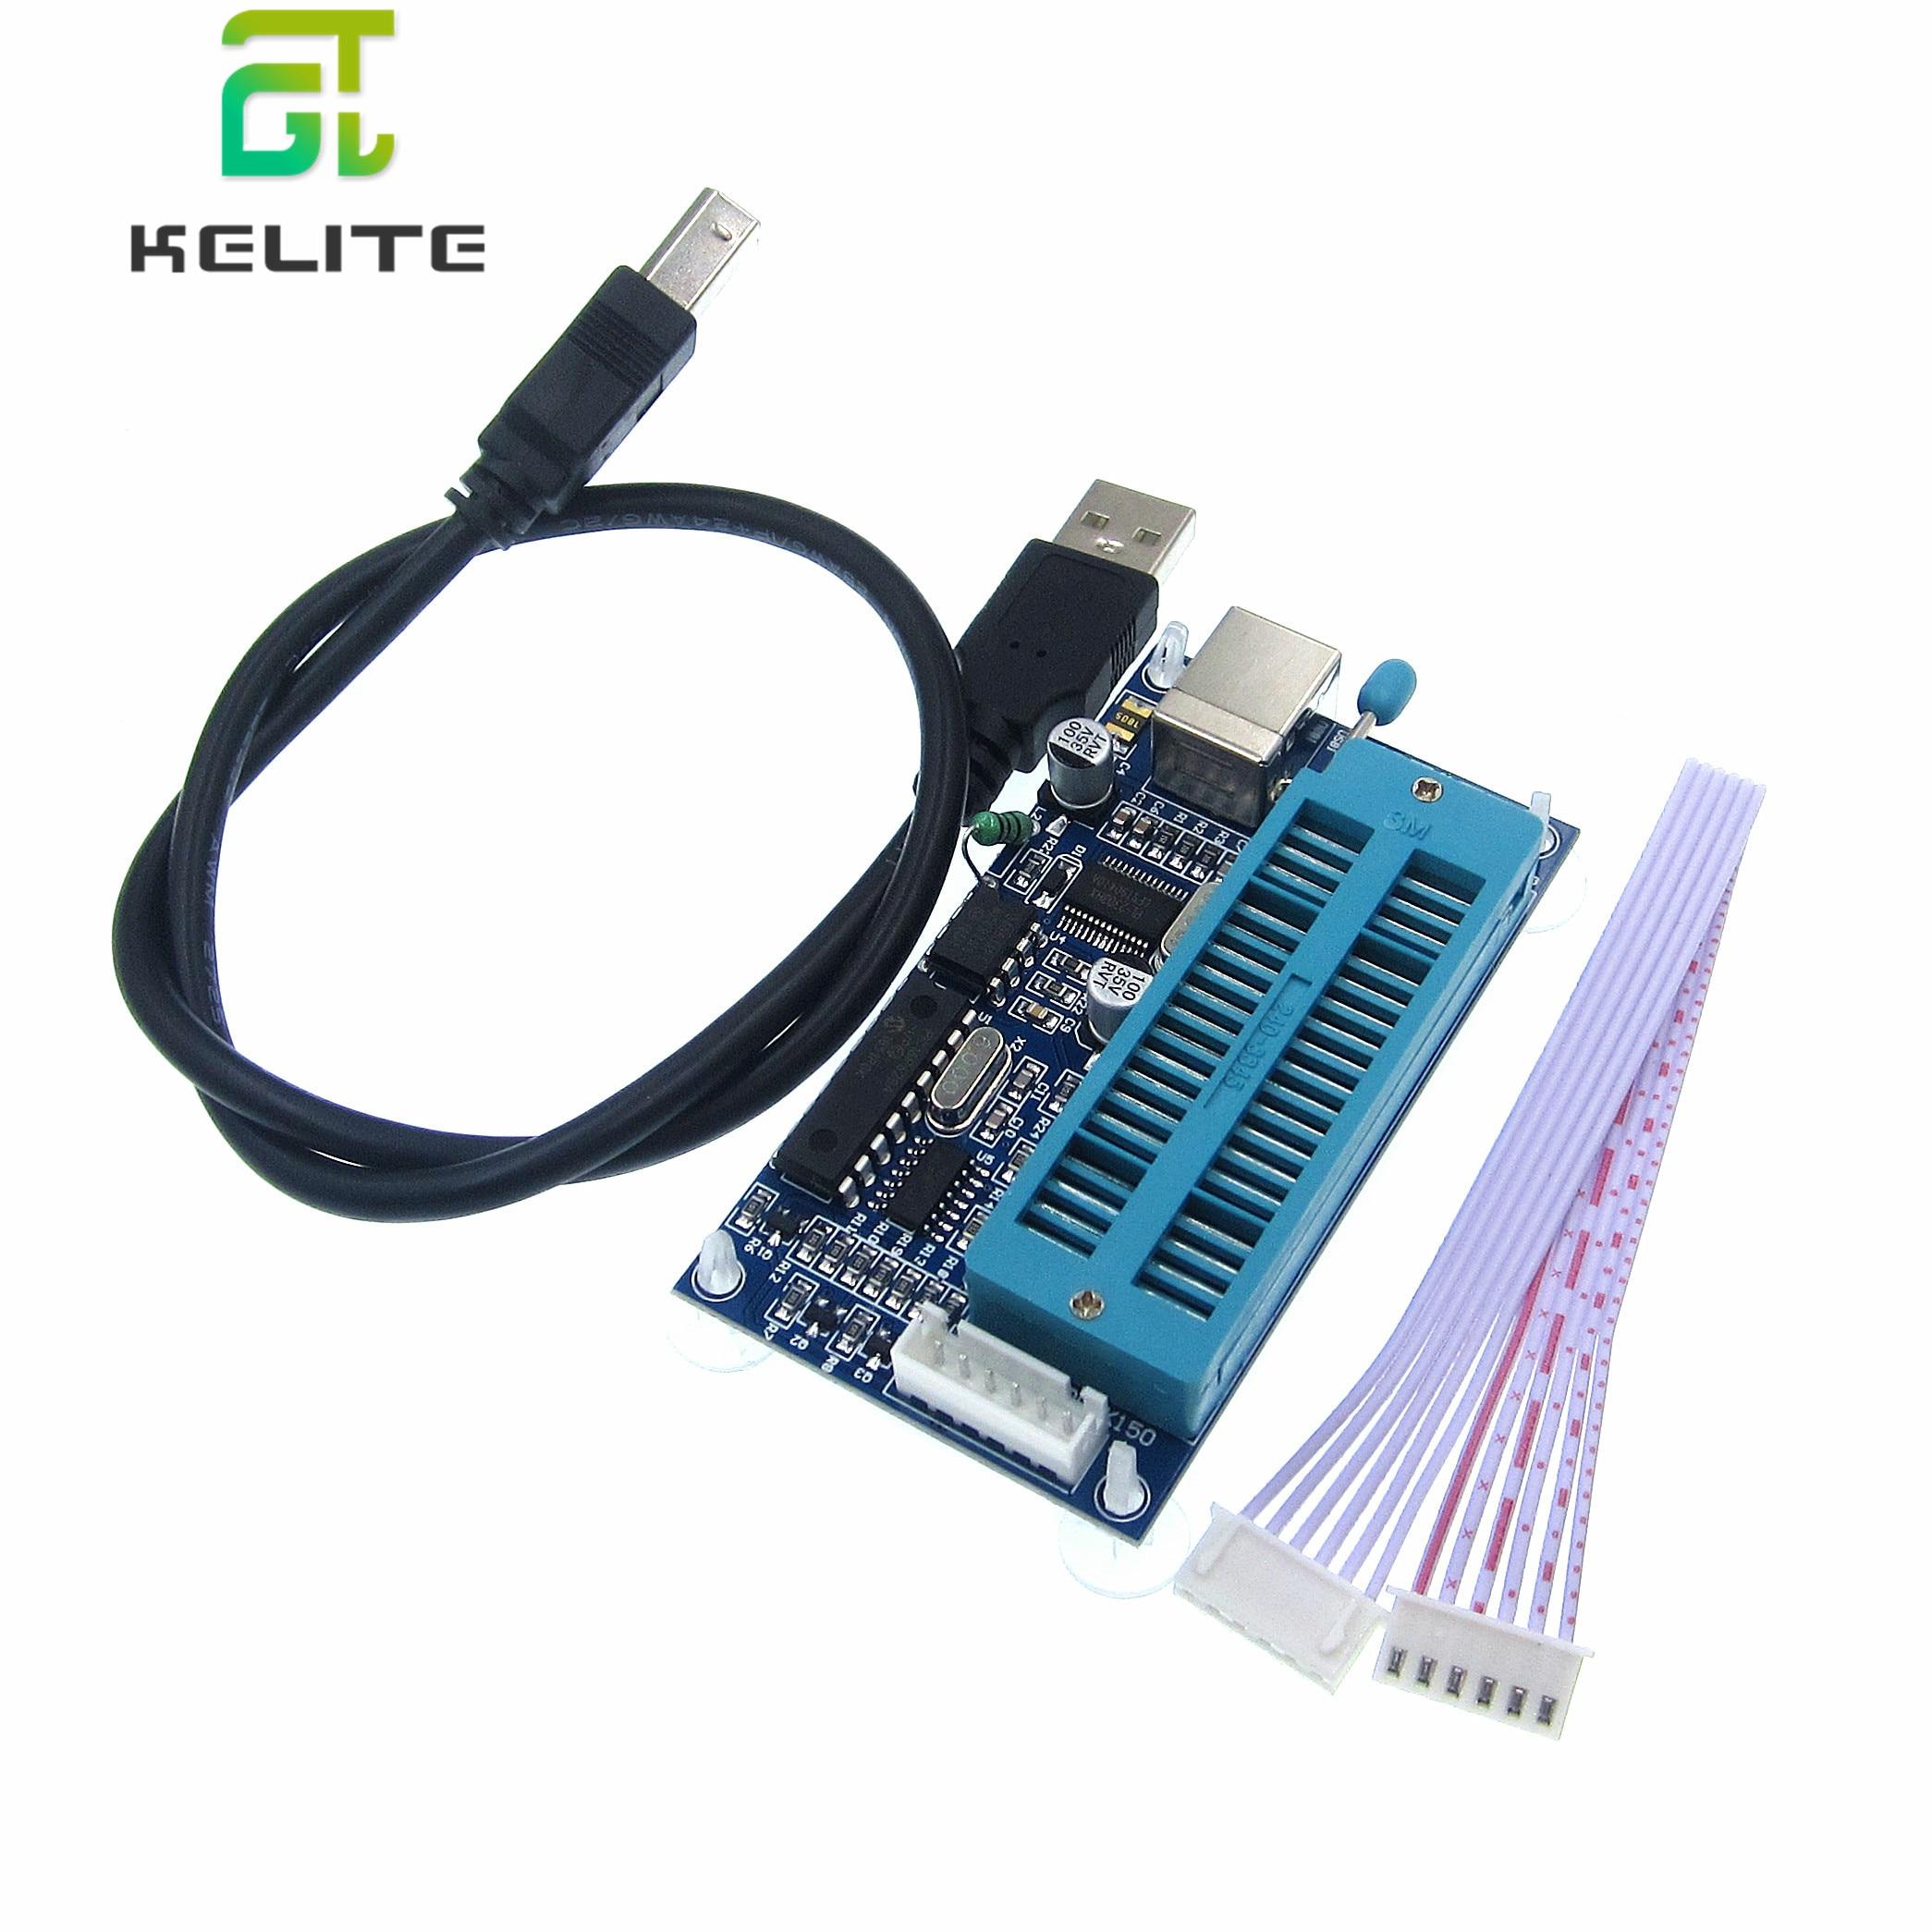 1 teile/los PIC K150 ICSP Programmierer USB Automatische Programmierung Entwickeln Mikrocontroller + USB ICSP kabel